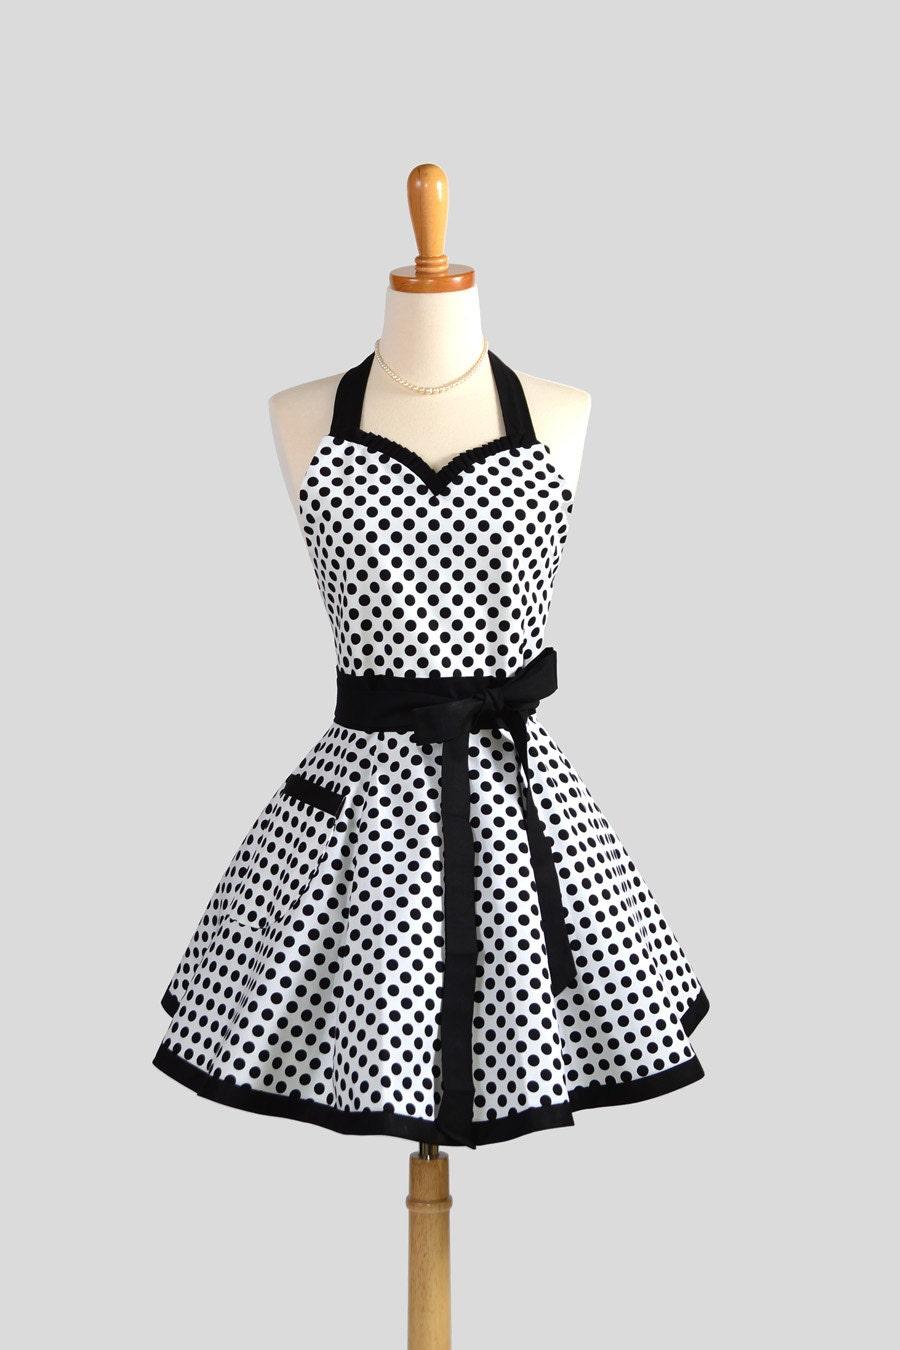 sweetheart retro apron cute retro womens apron by. Black Bedroom Furniture Sets. Home Design Ideas